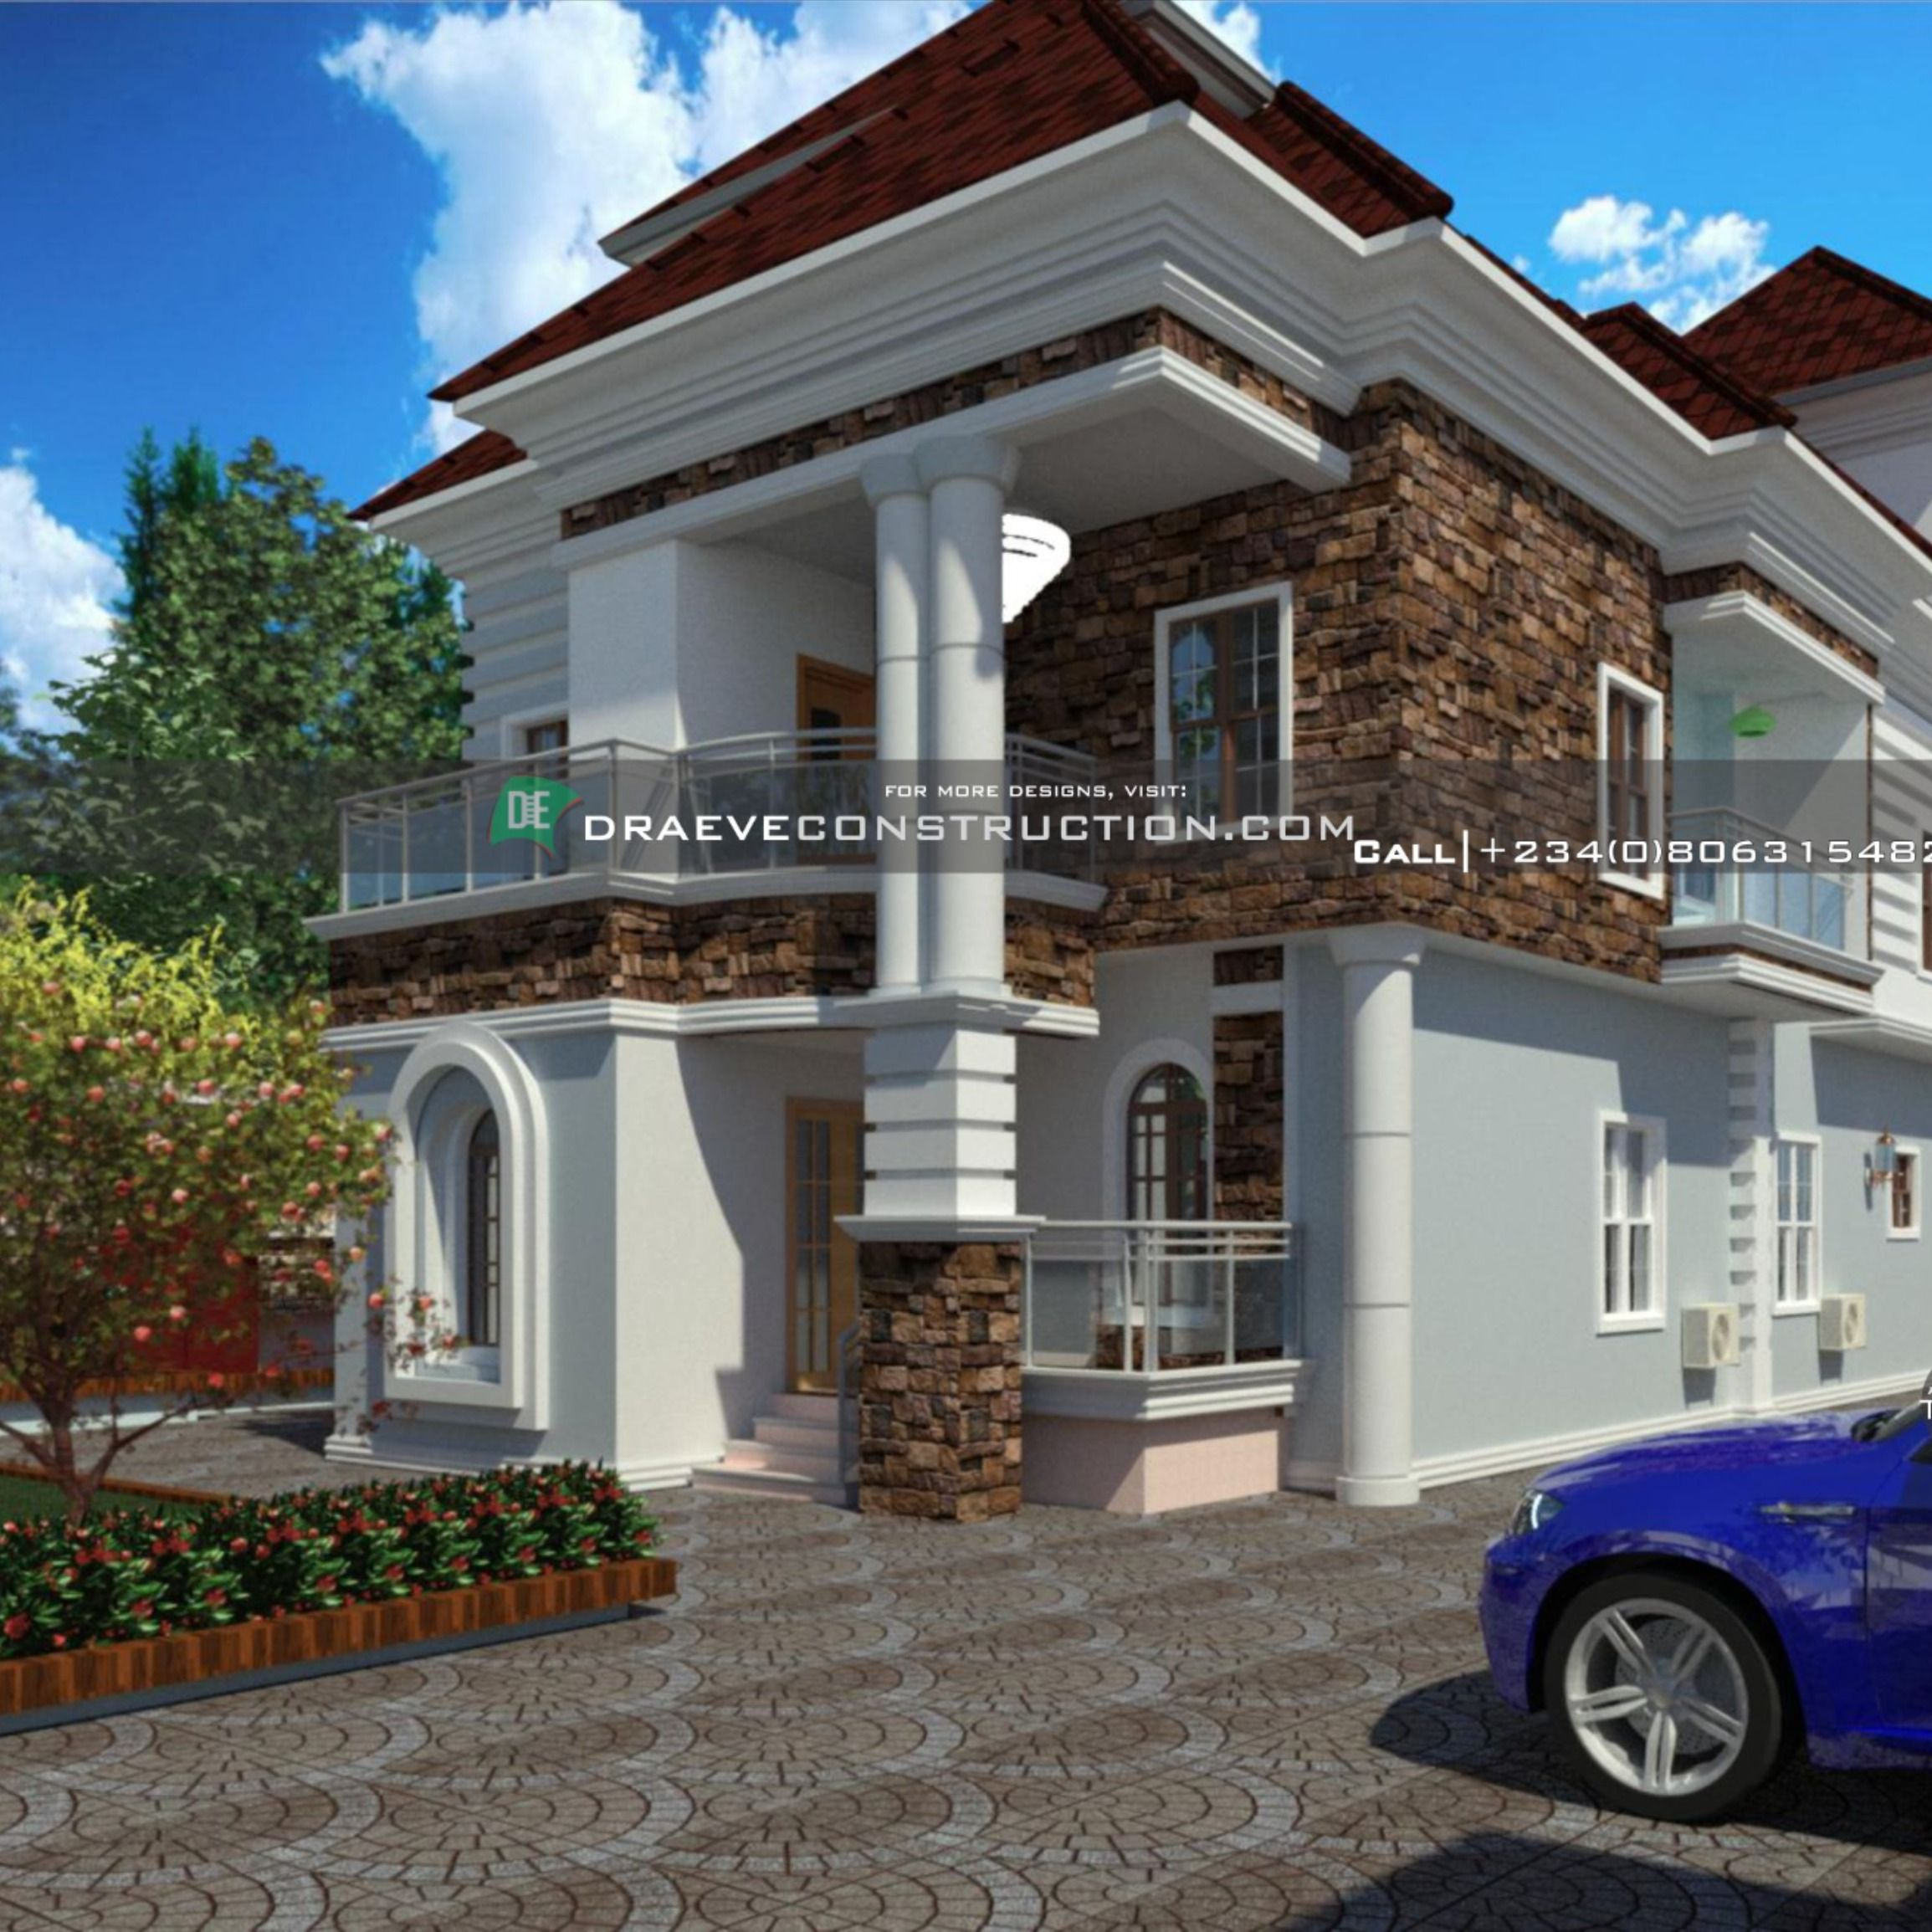 5 Bedroom Penthouse Design In Ghana Building House Plans Designs Architectural House Plans Building Design